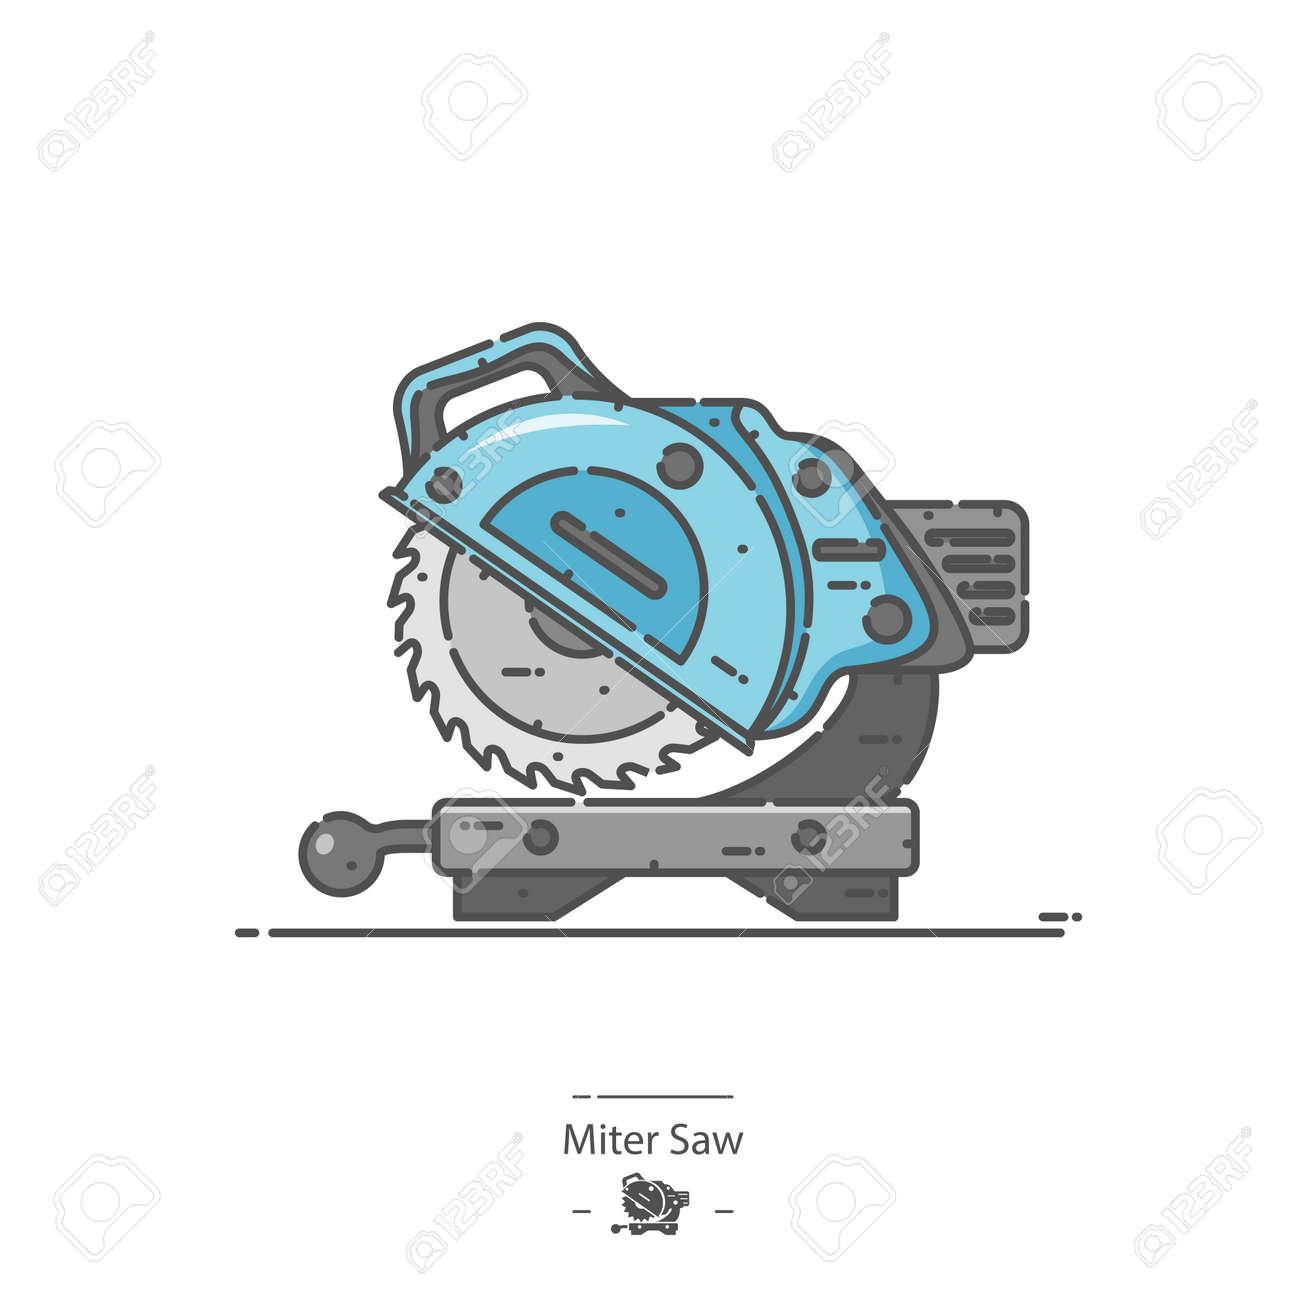 Miter Saw - Line color icon - 170638659